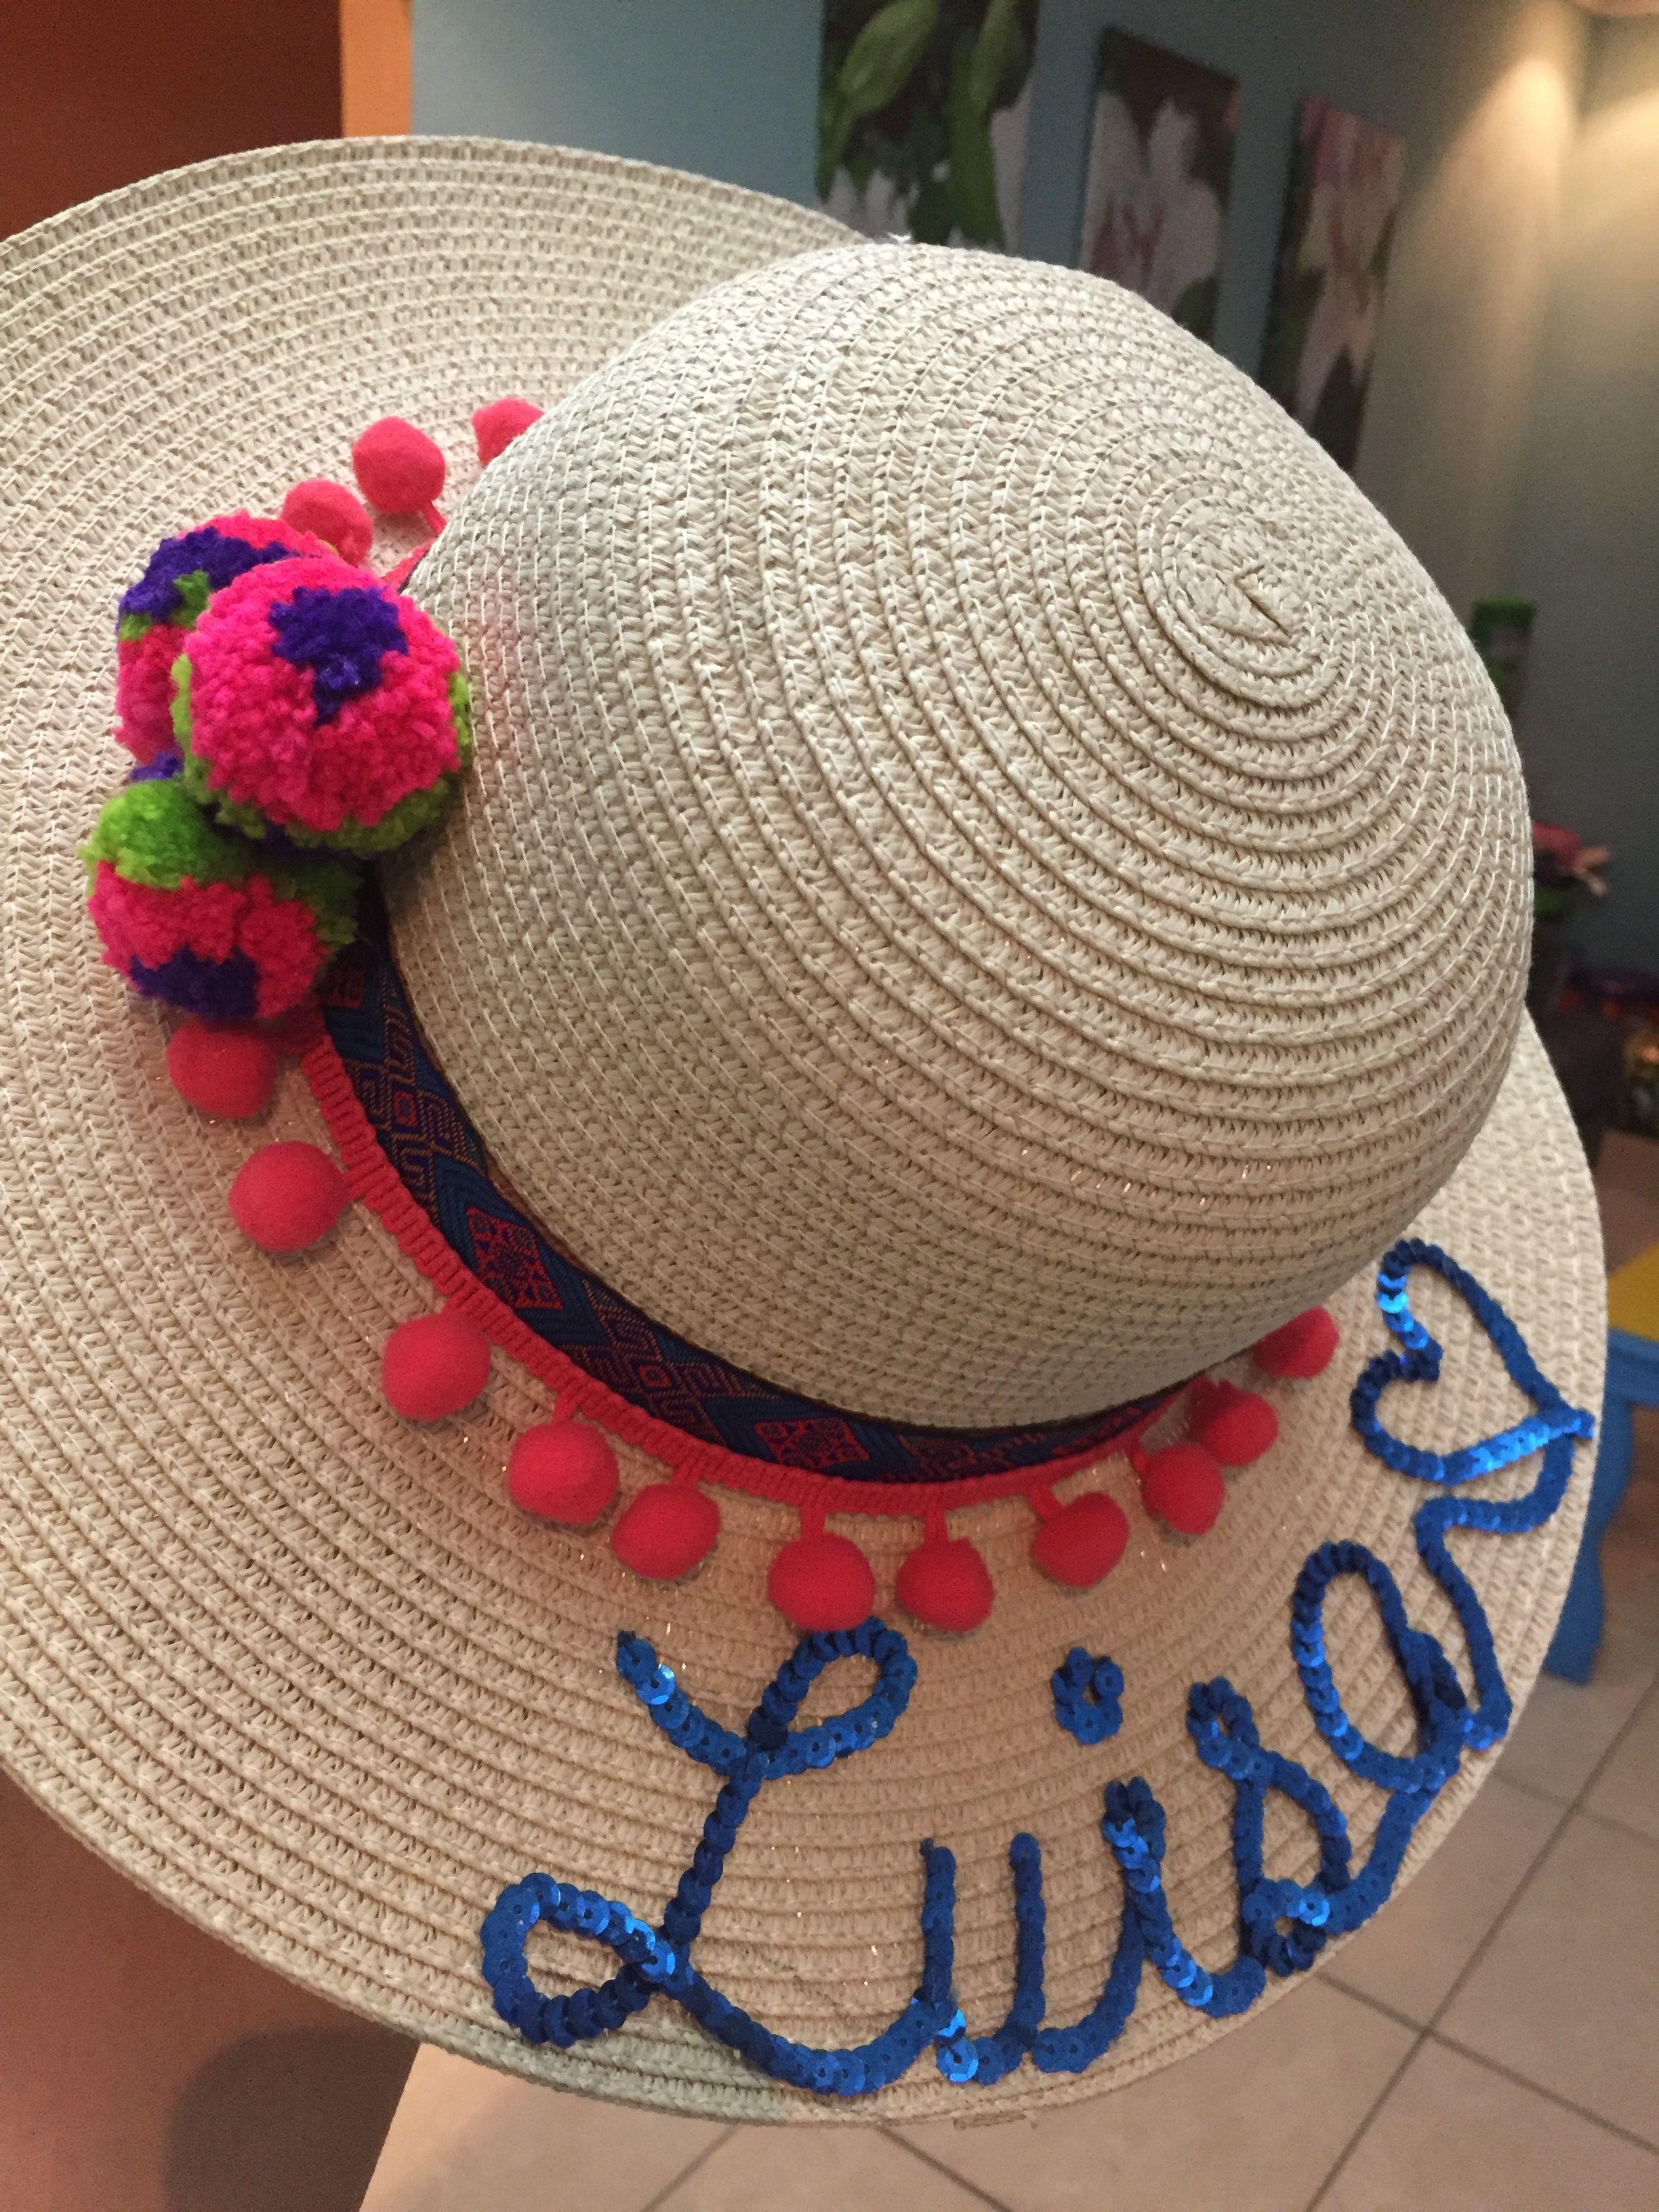 Sombreros personalizados By Stephanie Beitia Sombrero Playero fcbd73c3c9d